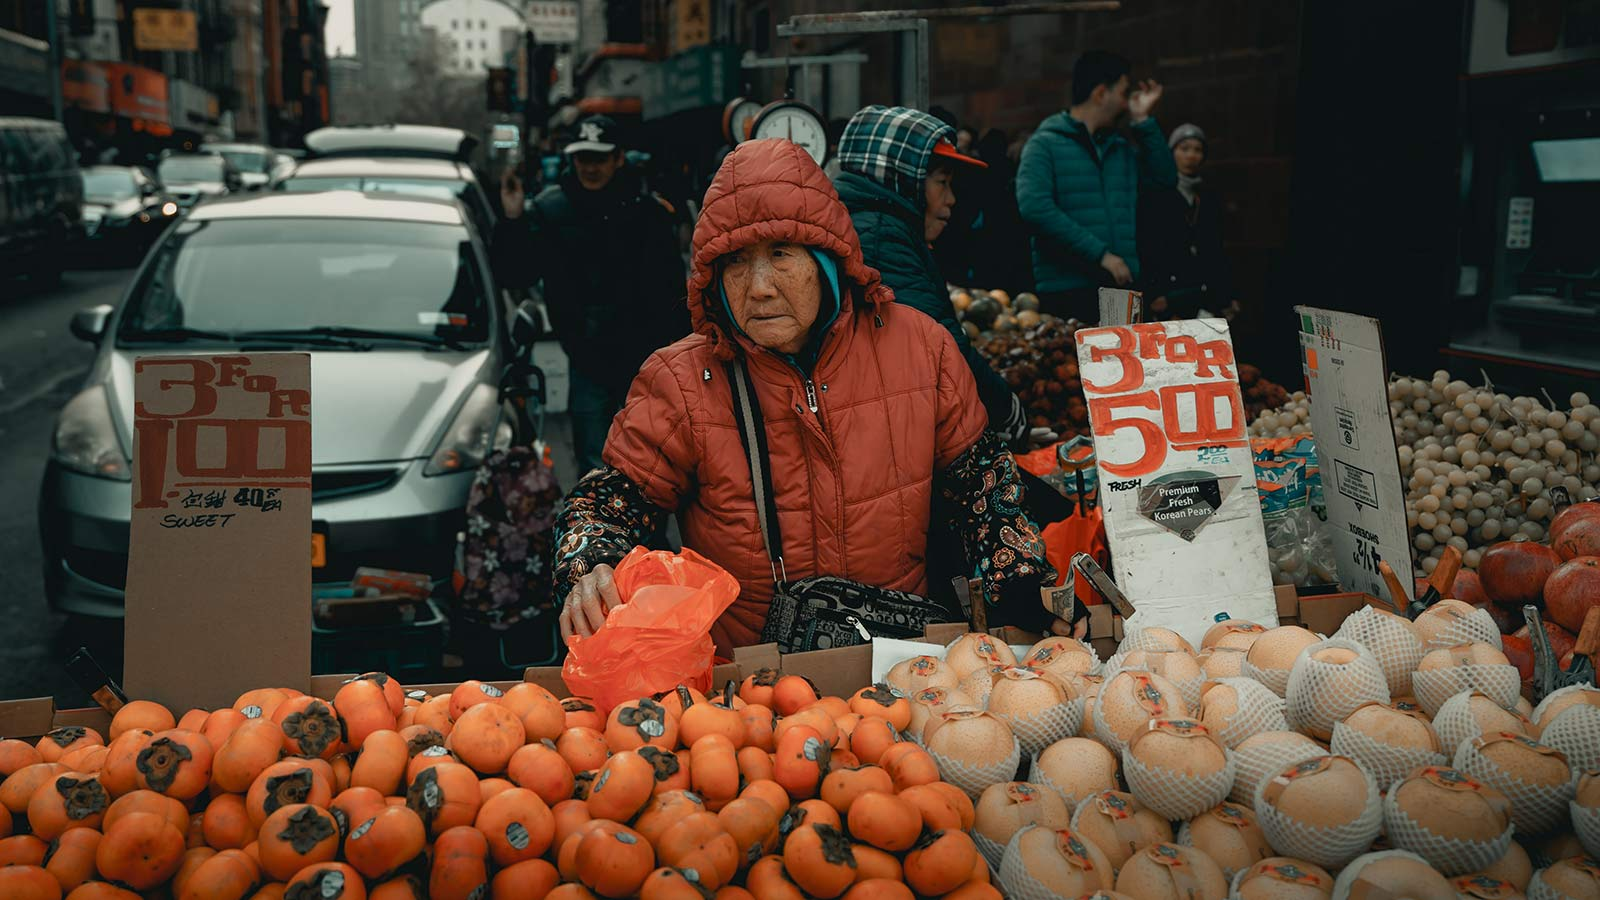 nyc-chinatown-street-vendor